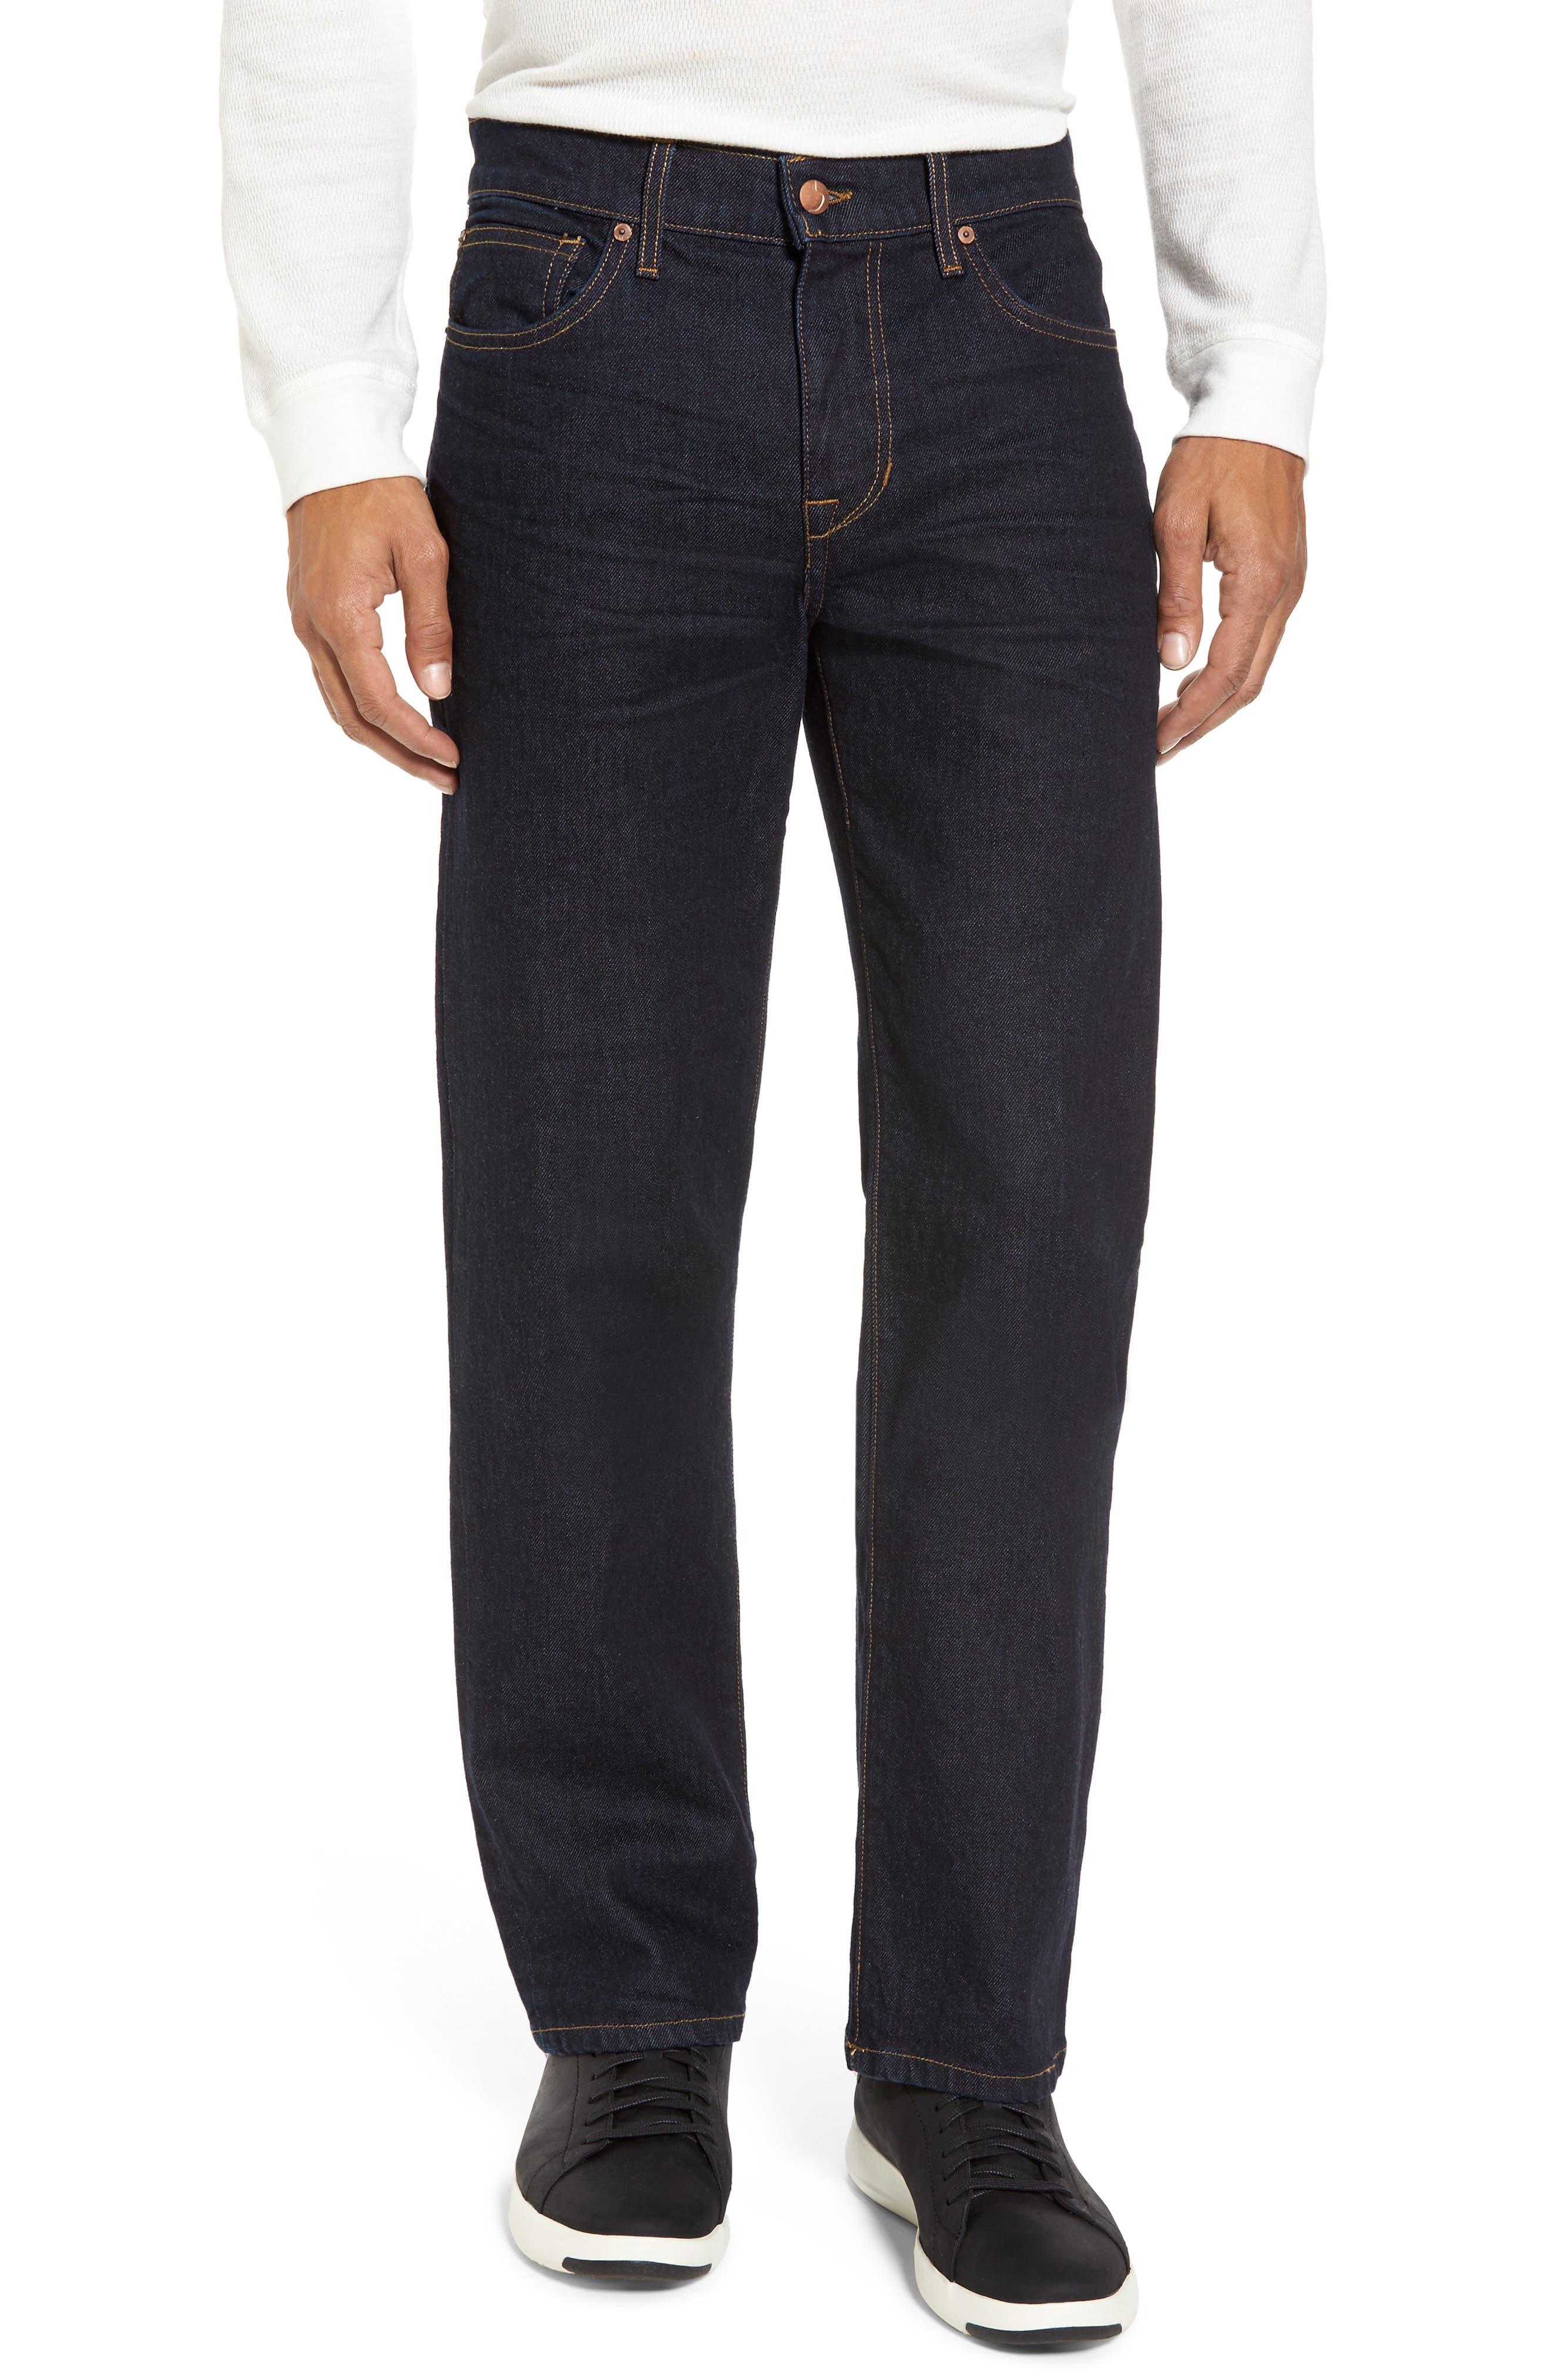 Brixton Slim Straight Leg Jeans,                         Main,                         color, Halford